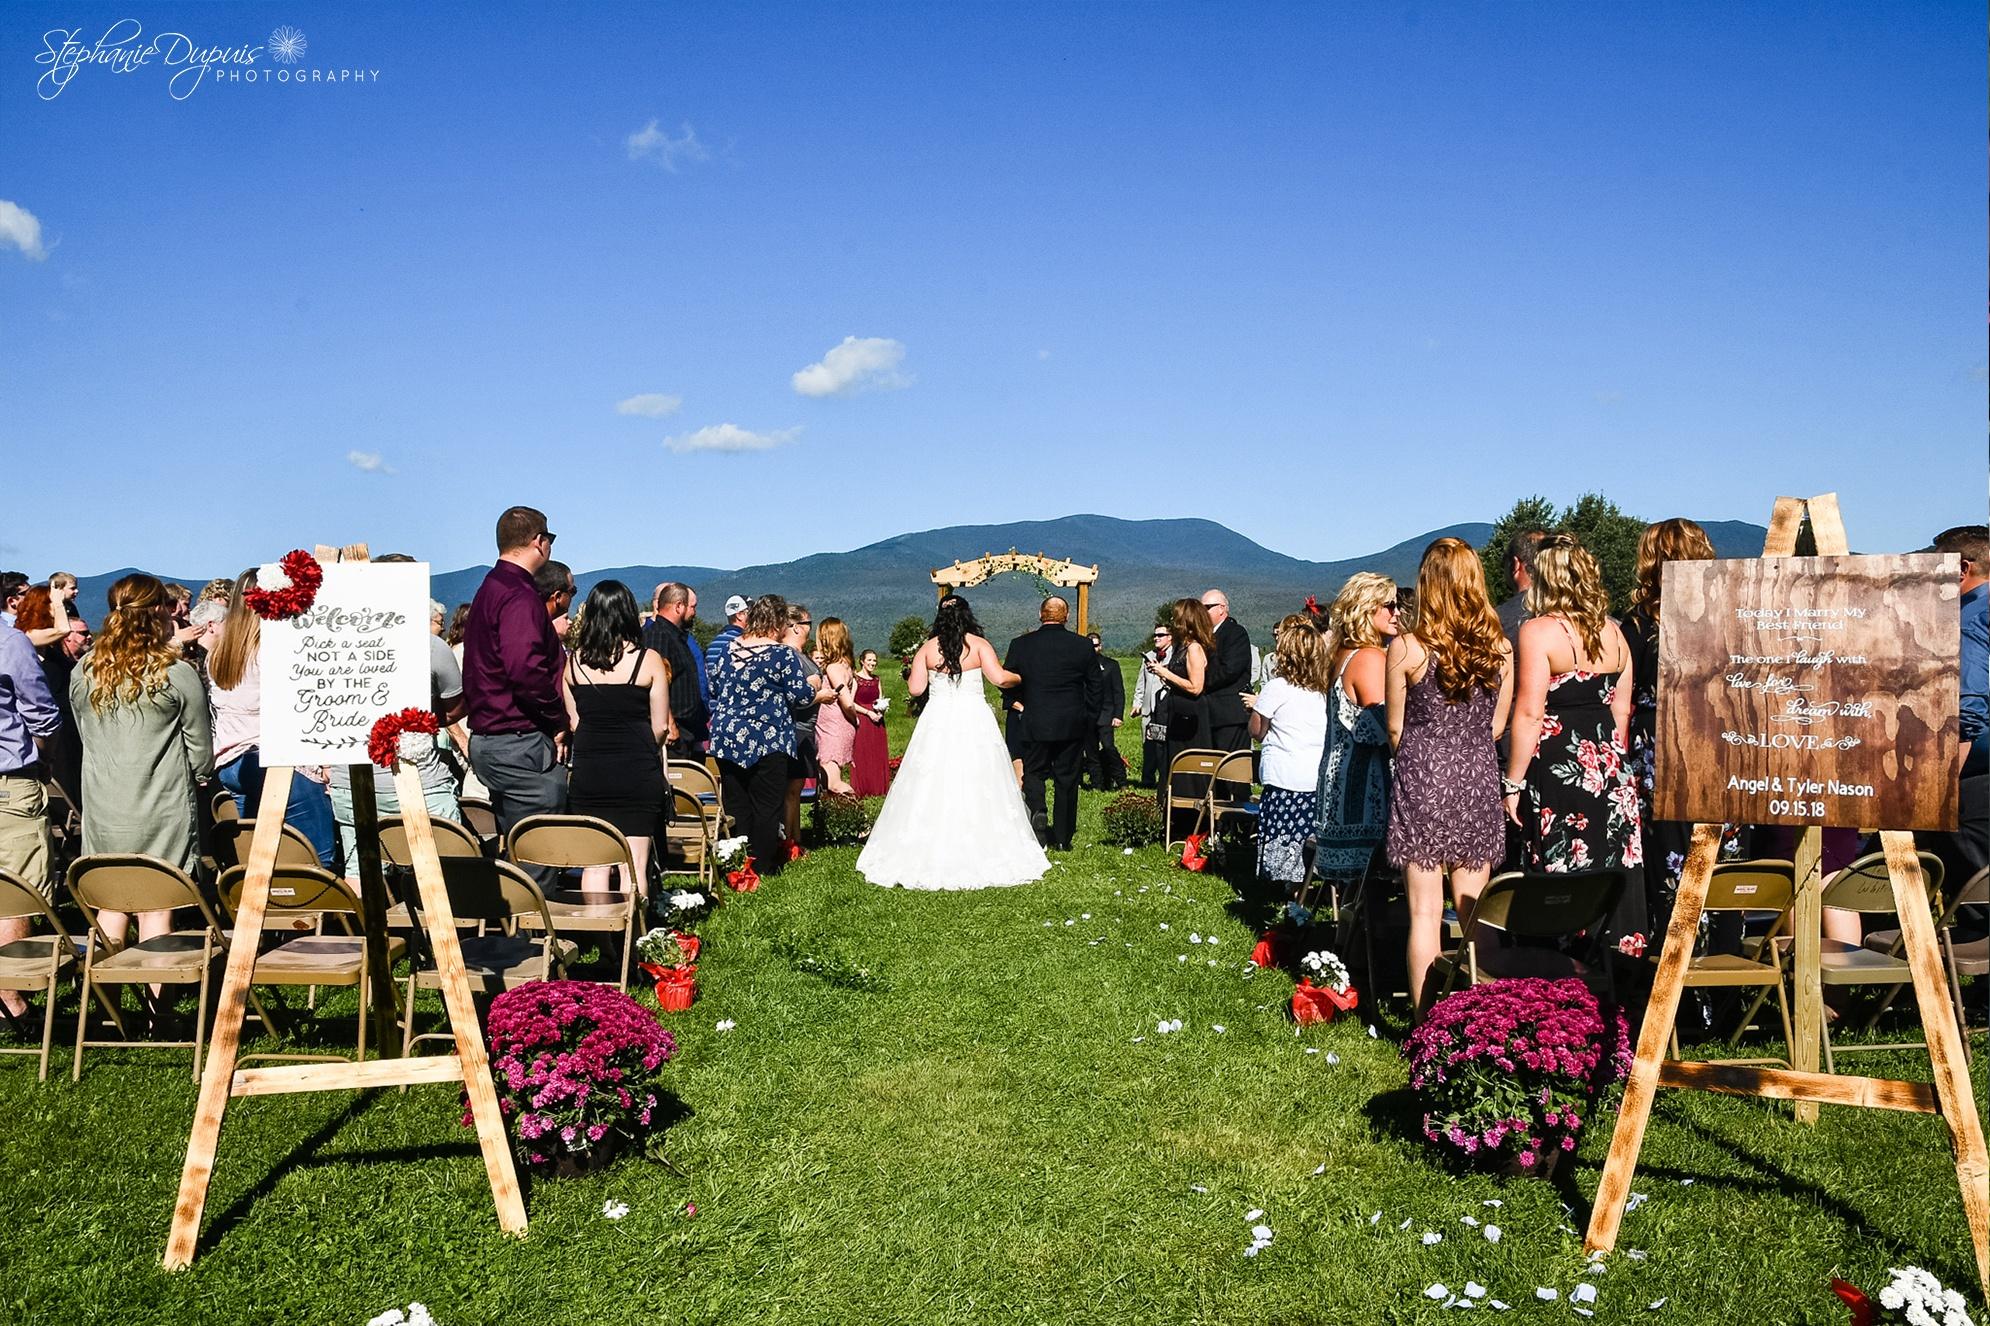 Lancaster Wedding Photographer 04 1 - Portfolio: Brown Wedding